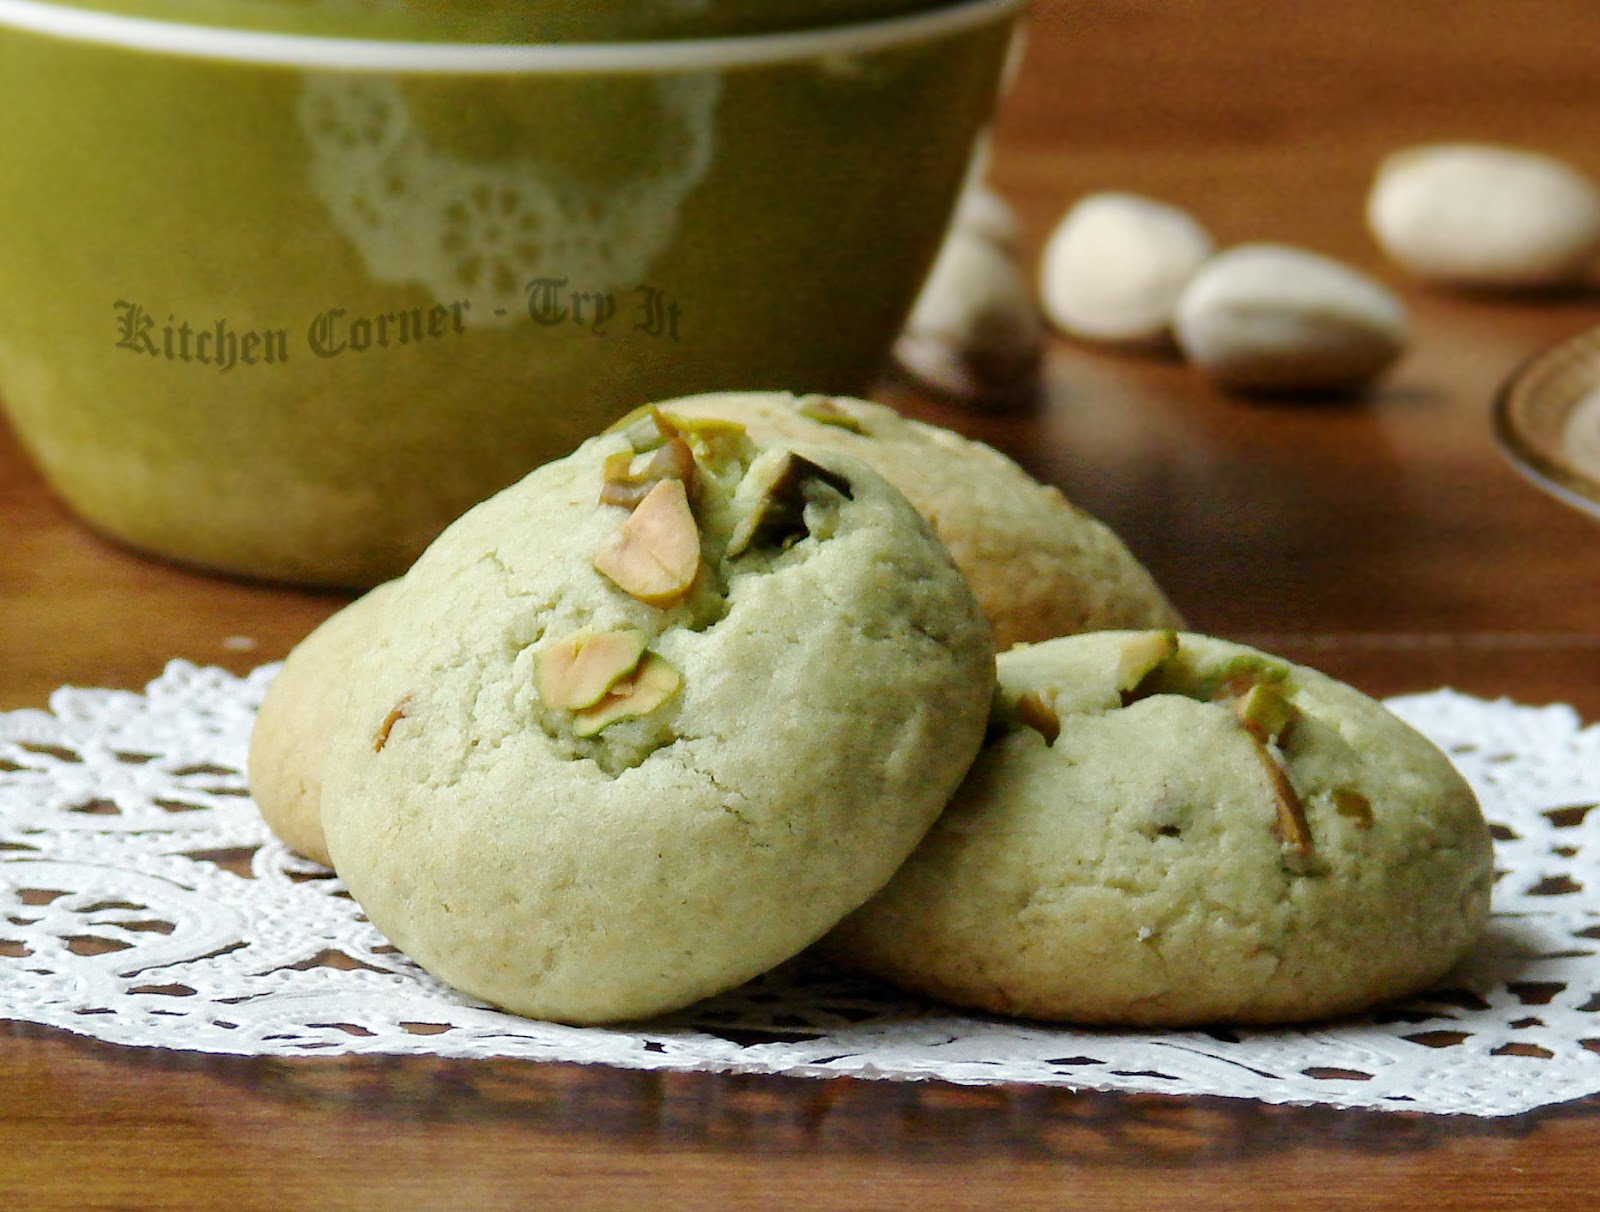 Pistachio Green Kitchen Cabinets